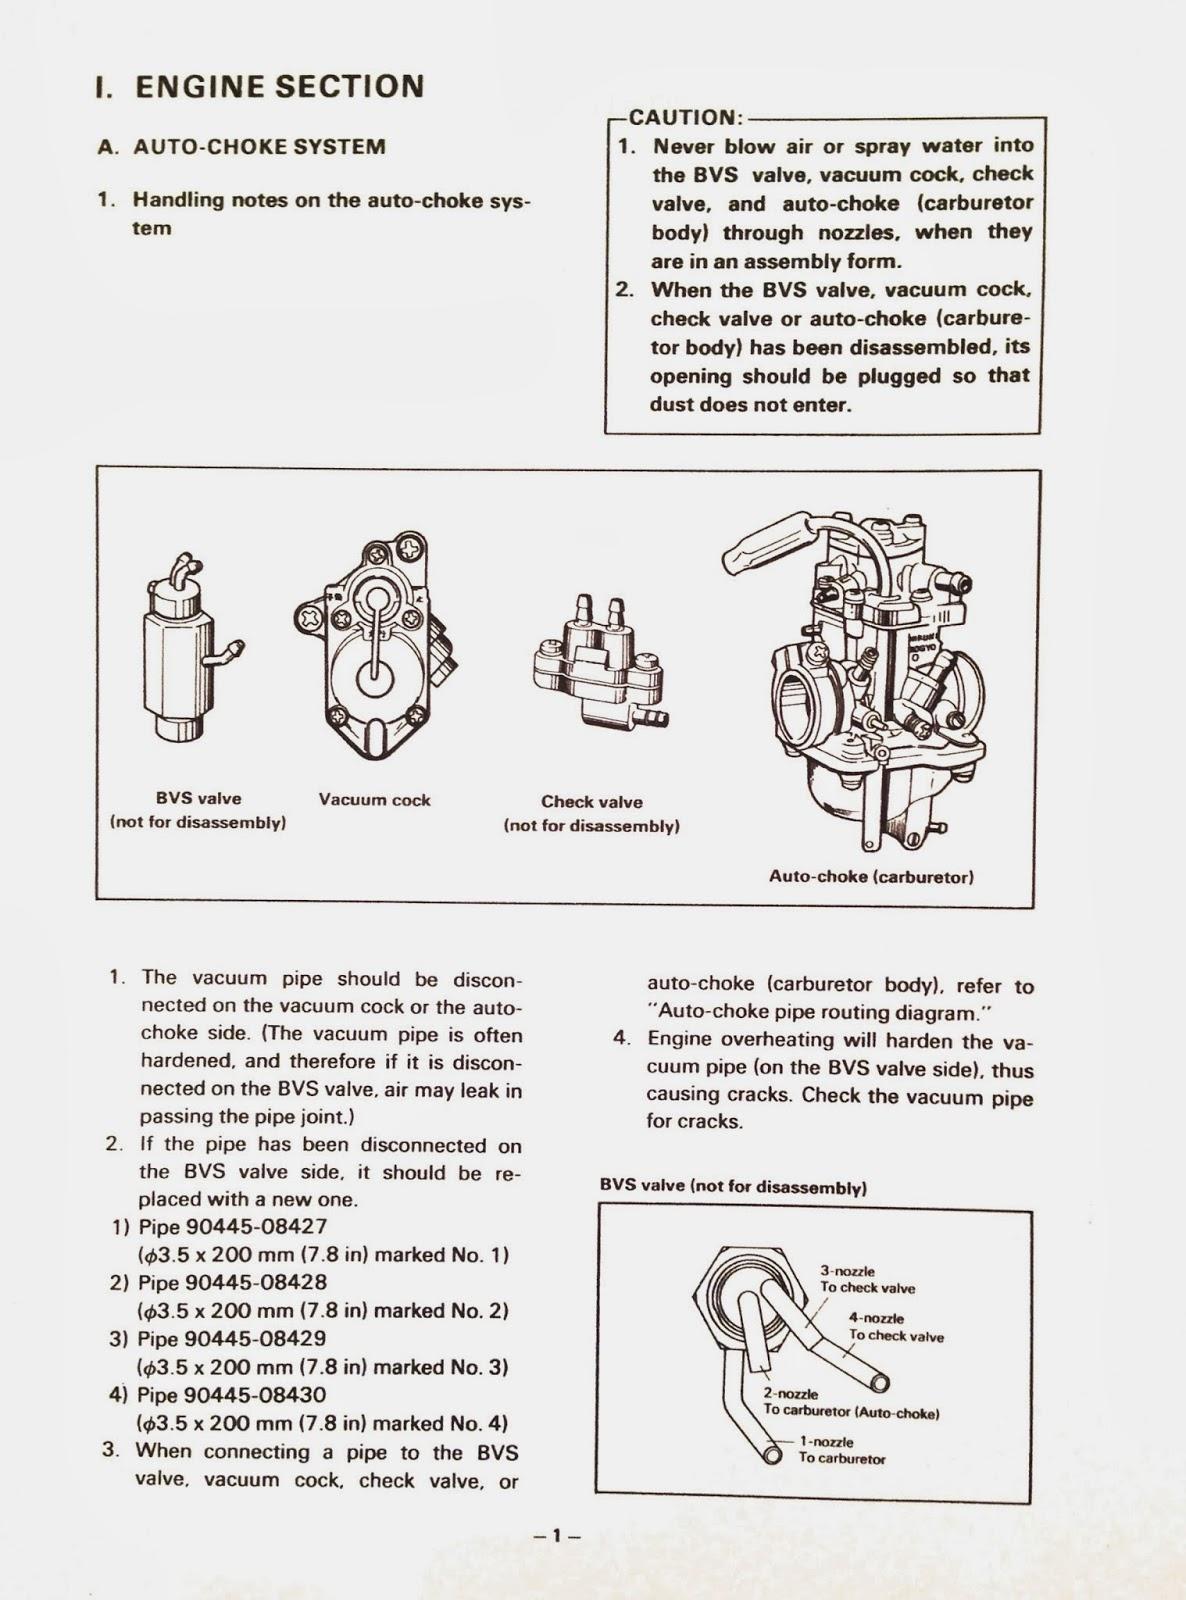 yamaha lc50 yamaha lc50 service manual lowe wiring diagram lc 50 service manual in jpg format